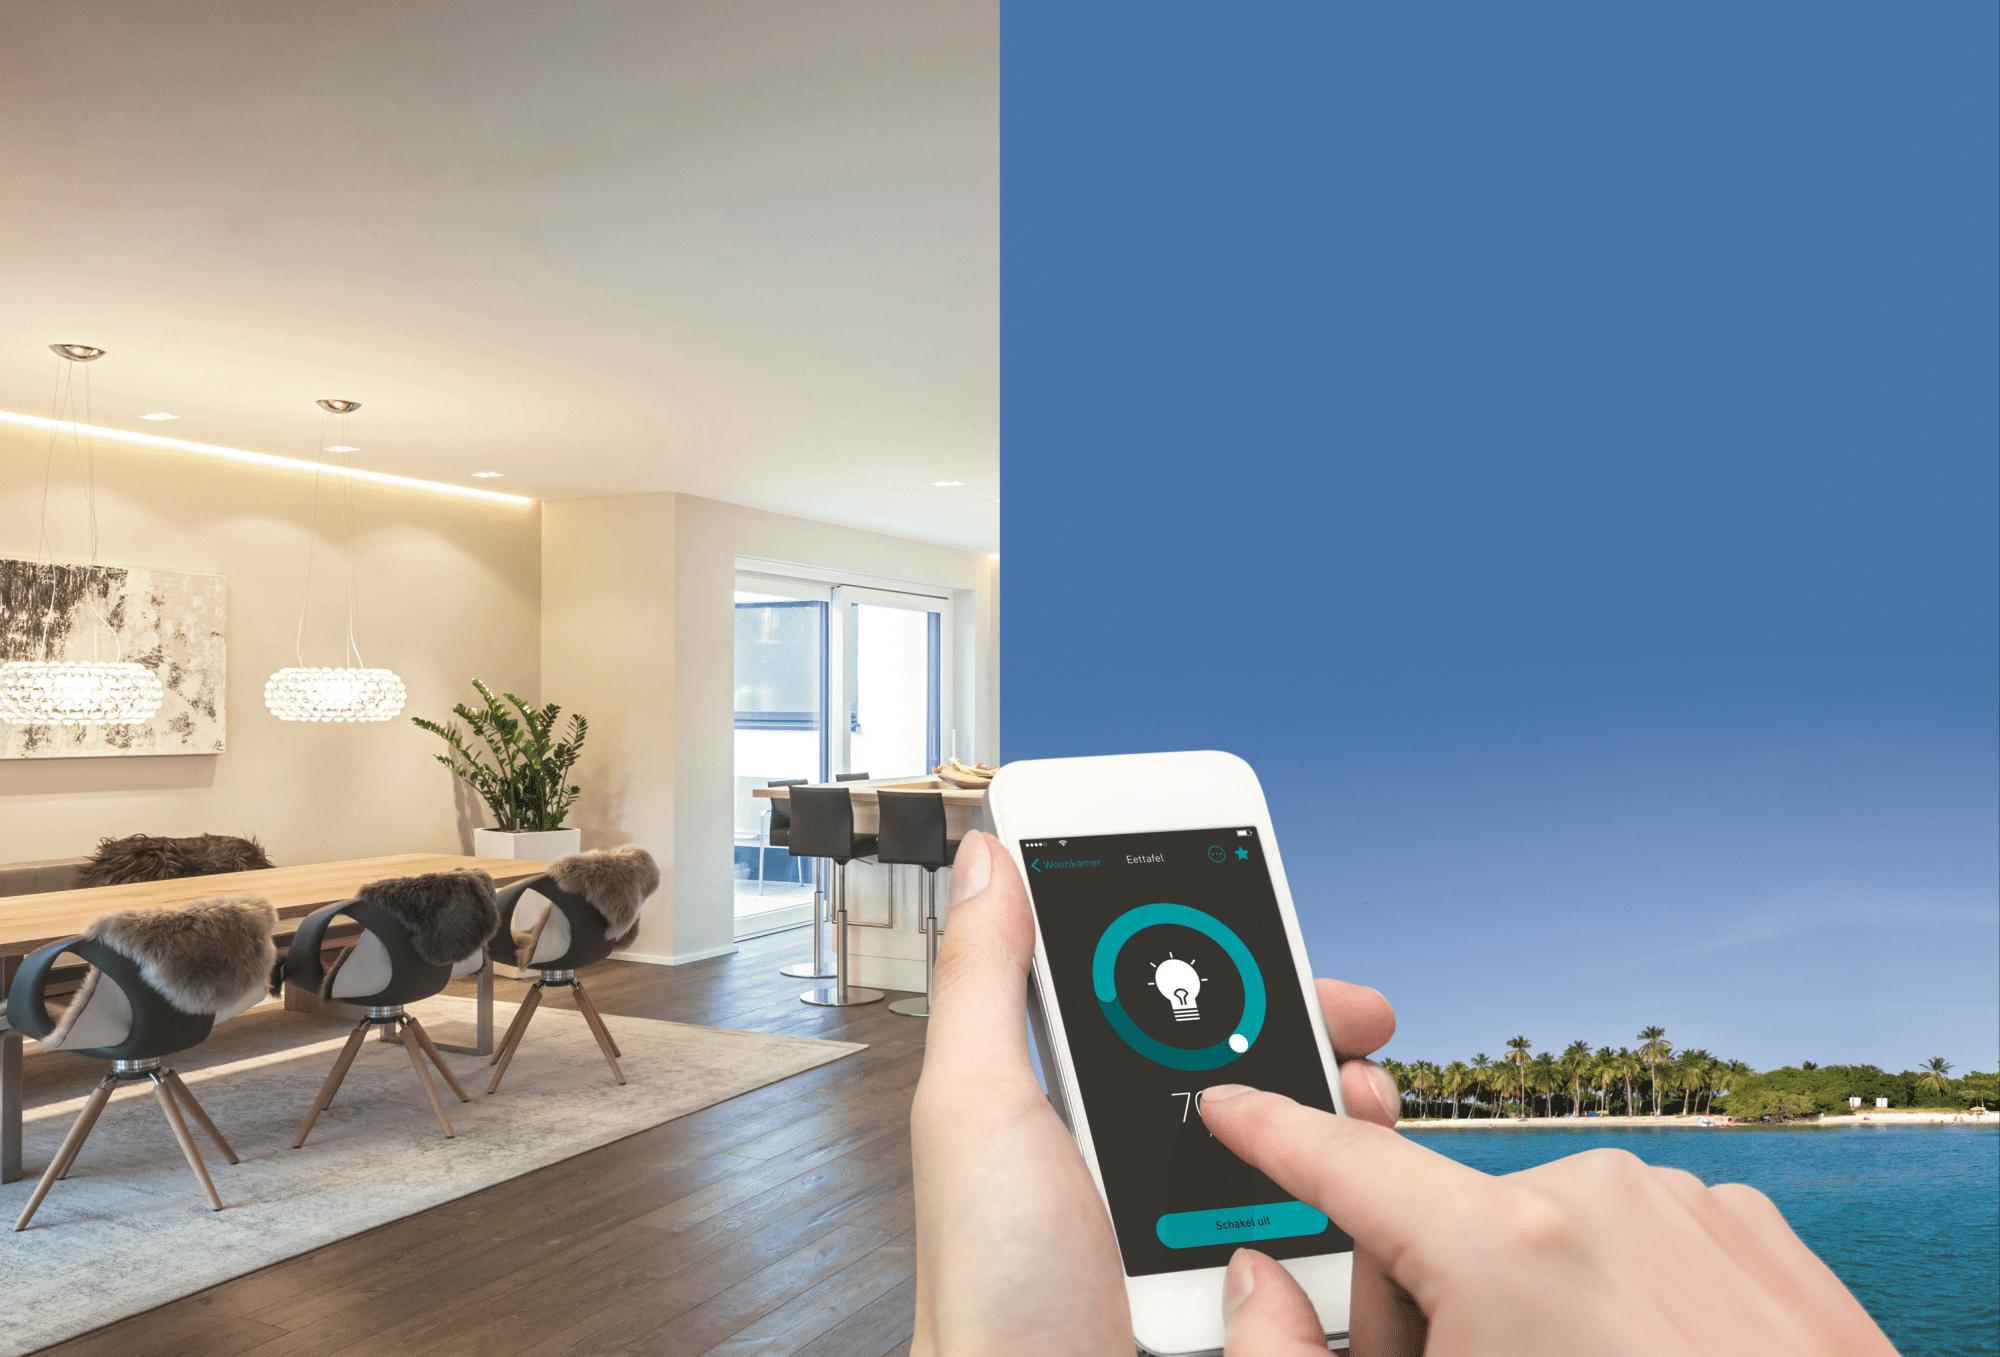 nieuw jung enet smart home oosterberg. Black Bedroom Furniture Sets. Home Design Ideas